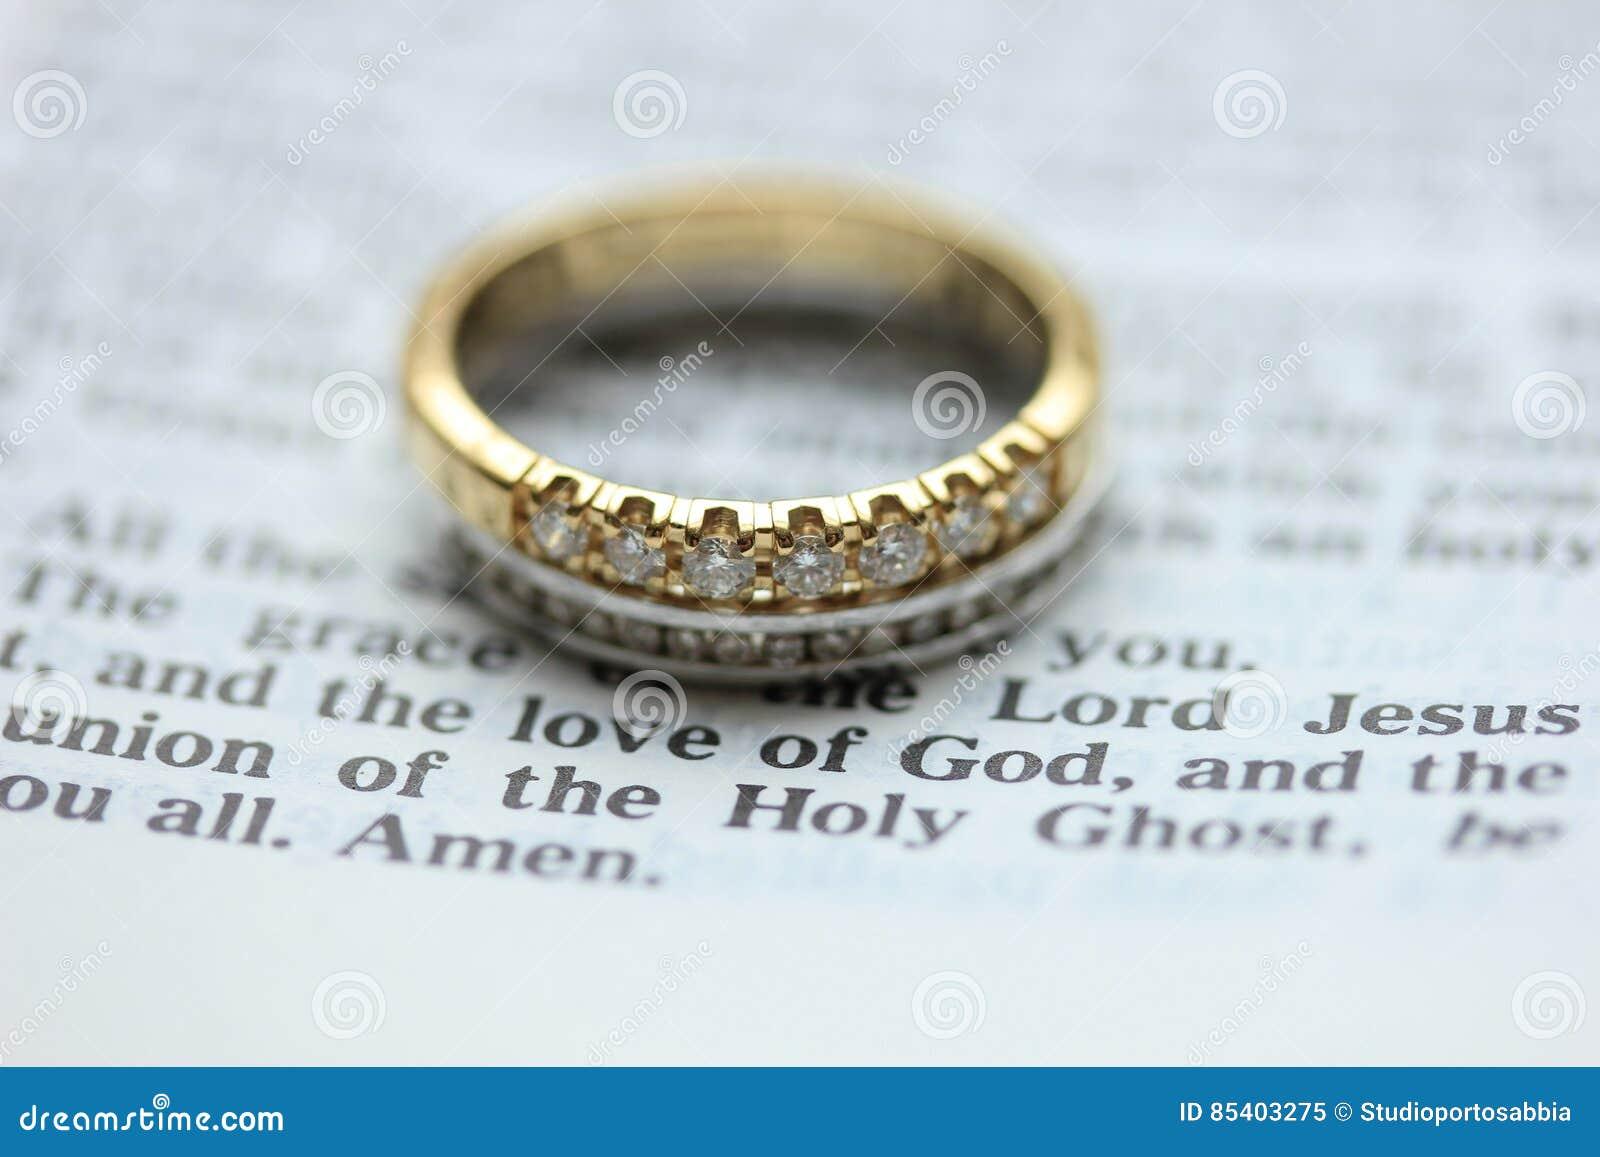 bibelvers diamantene hochzeit